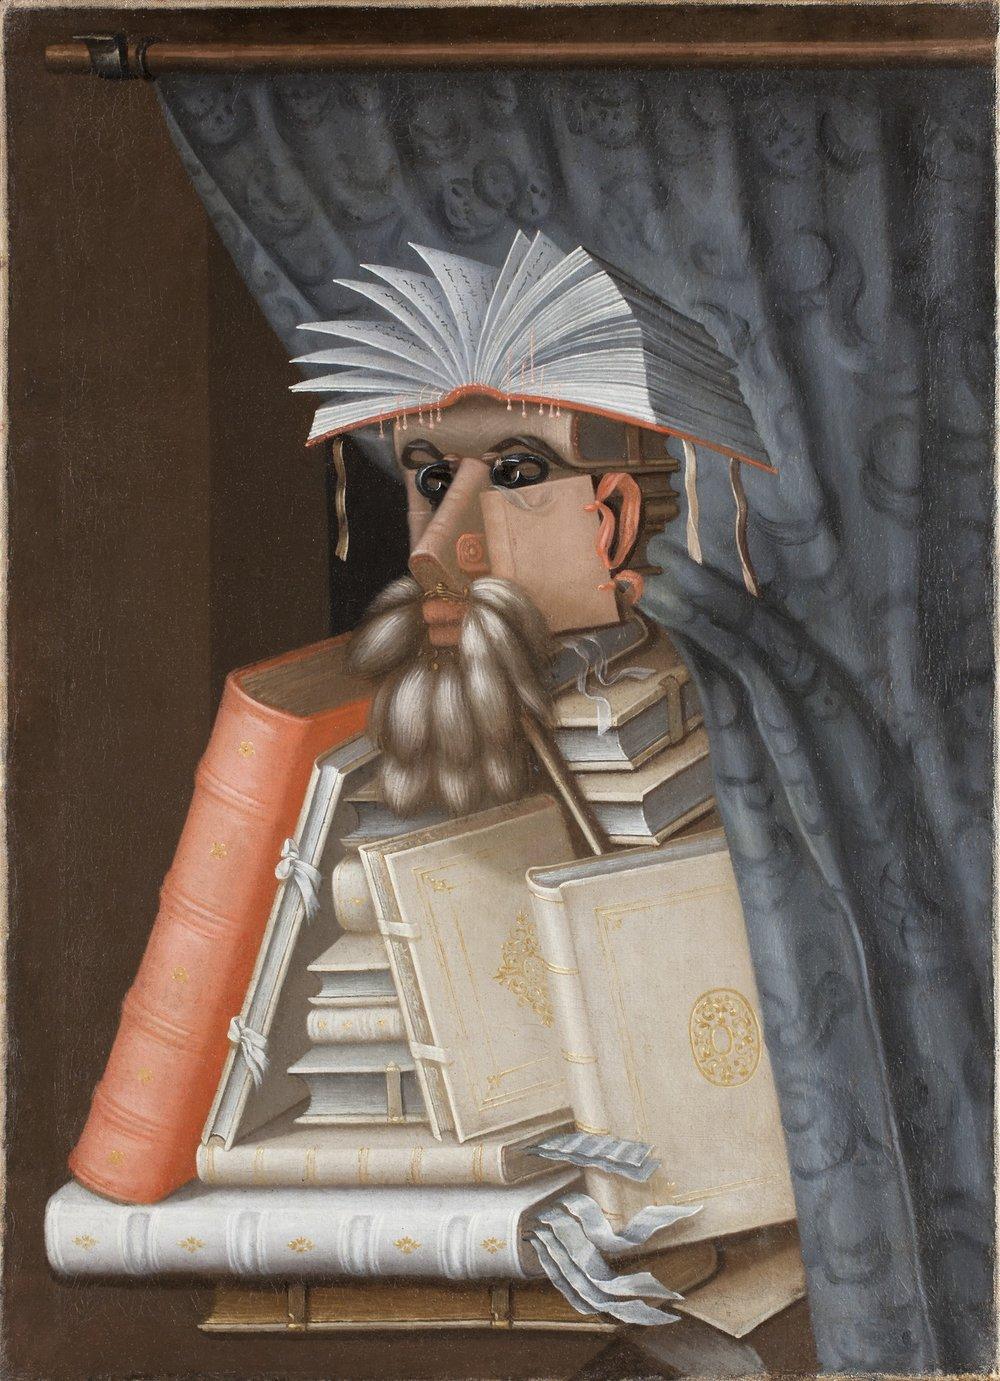 Giuseppe Arcimboldo, The Librarian , 1566, oil on canvas.